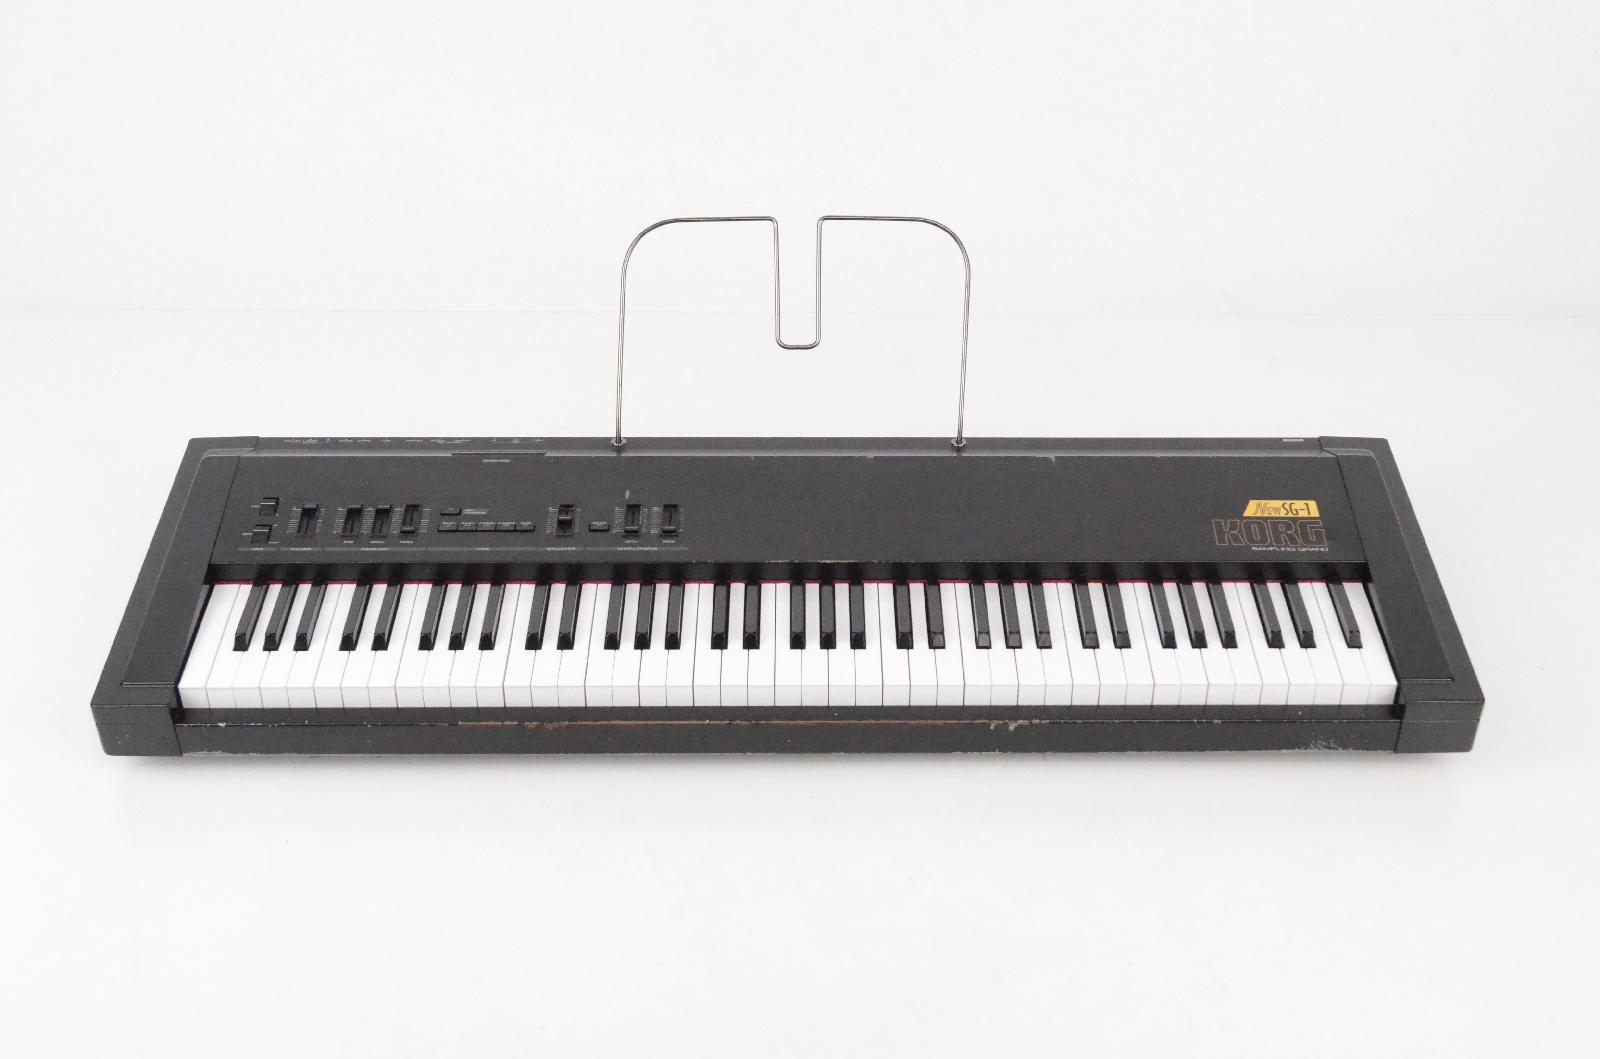 Korg New SG-1 Sampling Piano Keyboard 76 Weighted Keys w/ Case SG1 MIDI #32692